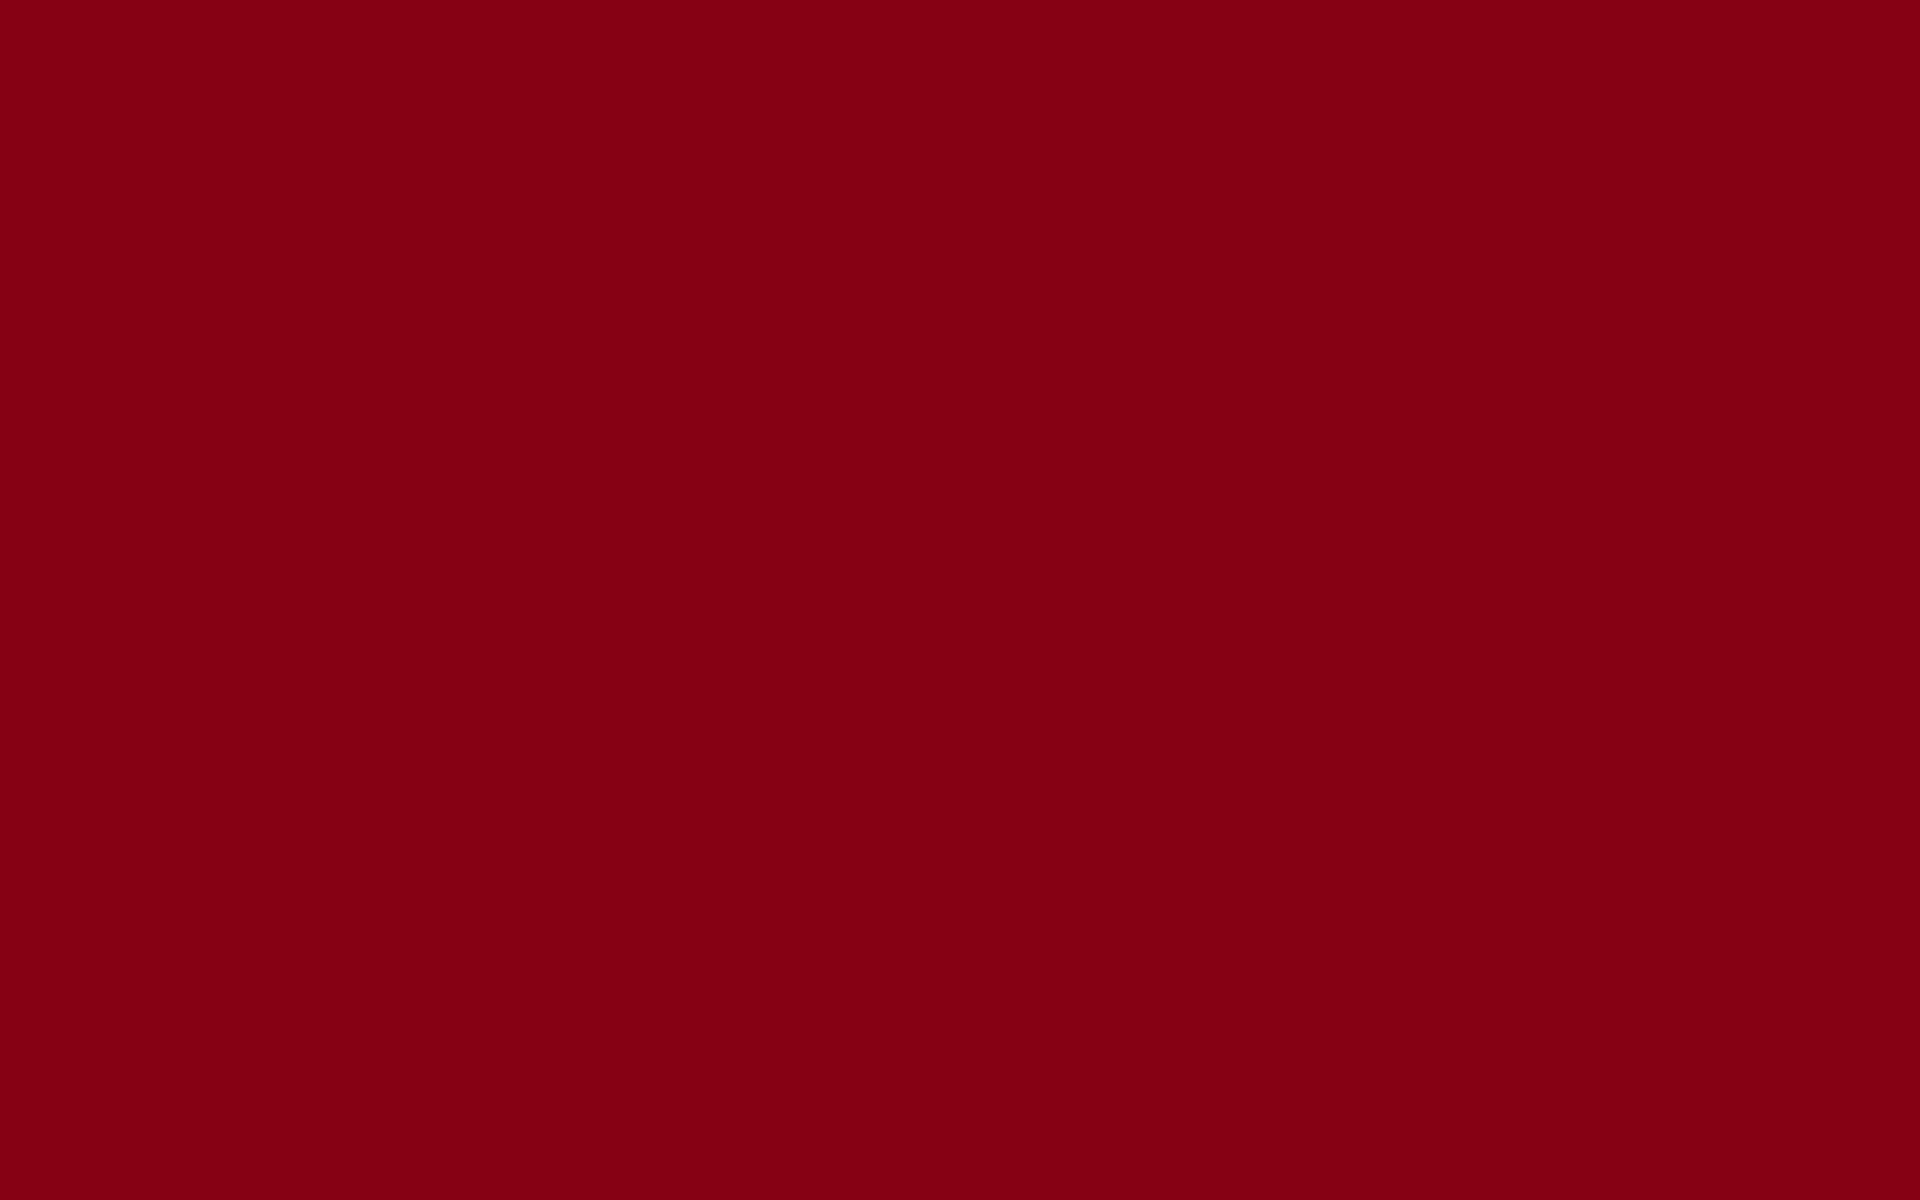 1920x1200 Red Devil Solid Color Background